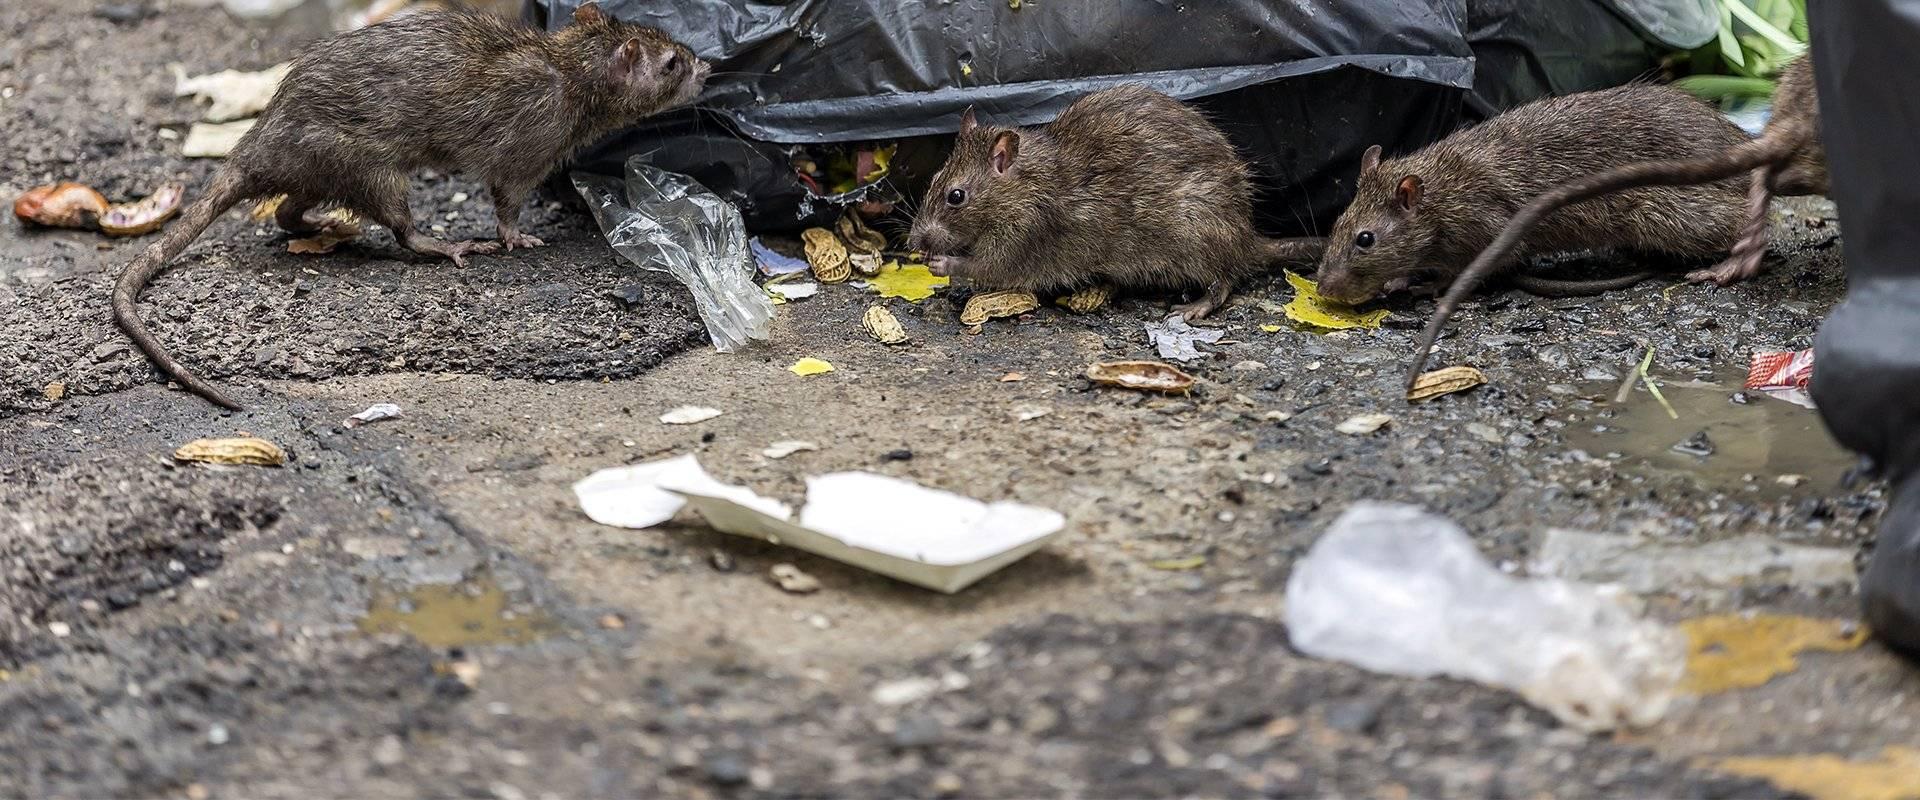 rats eating the trash